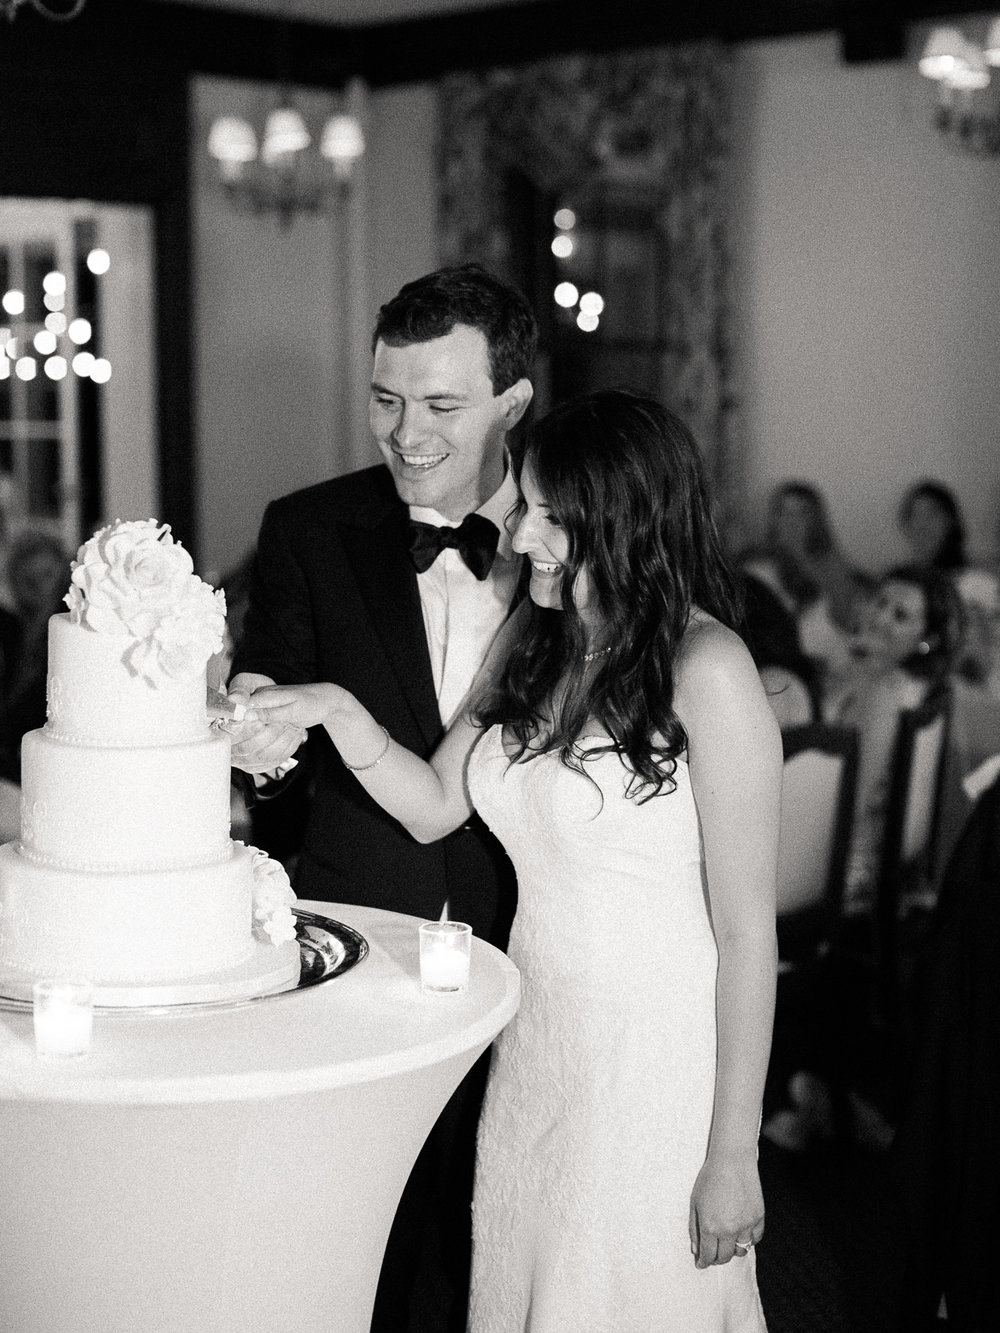 0075-Nadia-Chris-Married-When He Founf Her-Toronto Golf Club.jpg